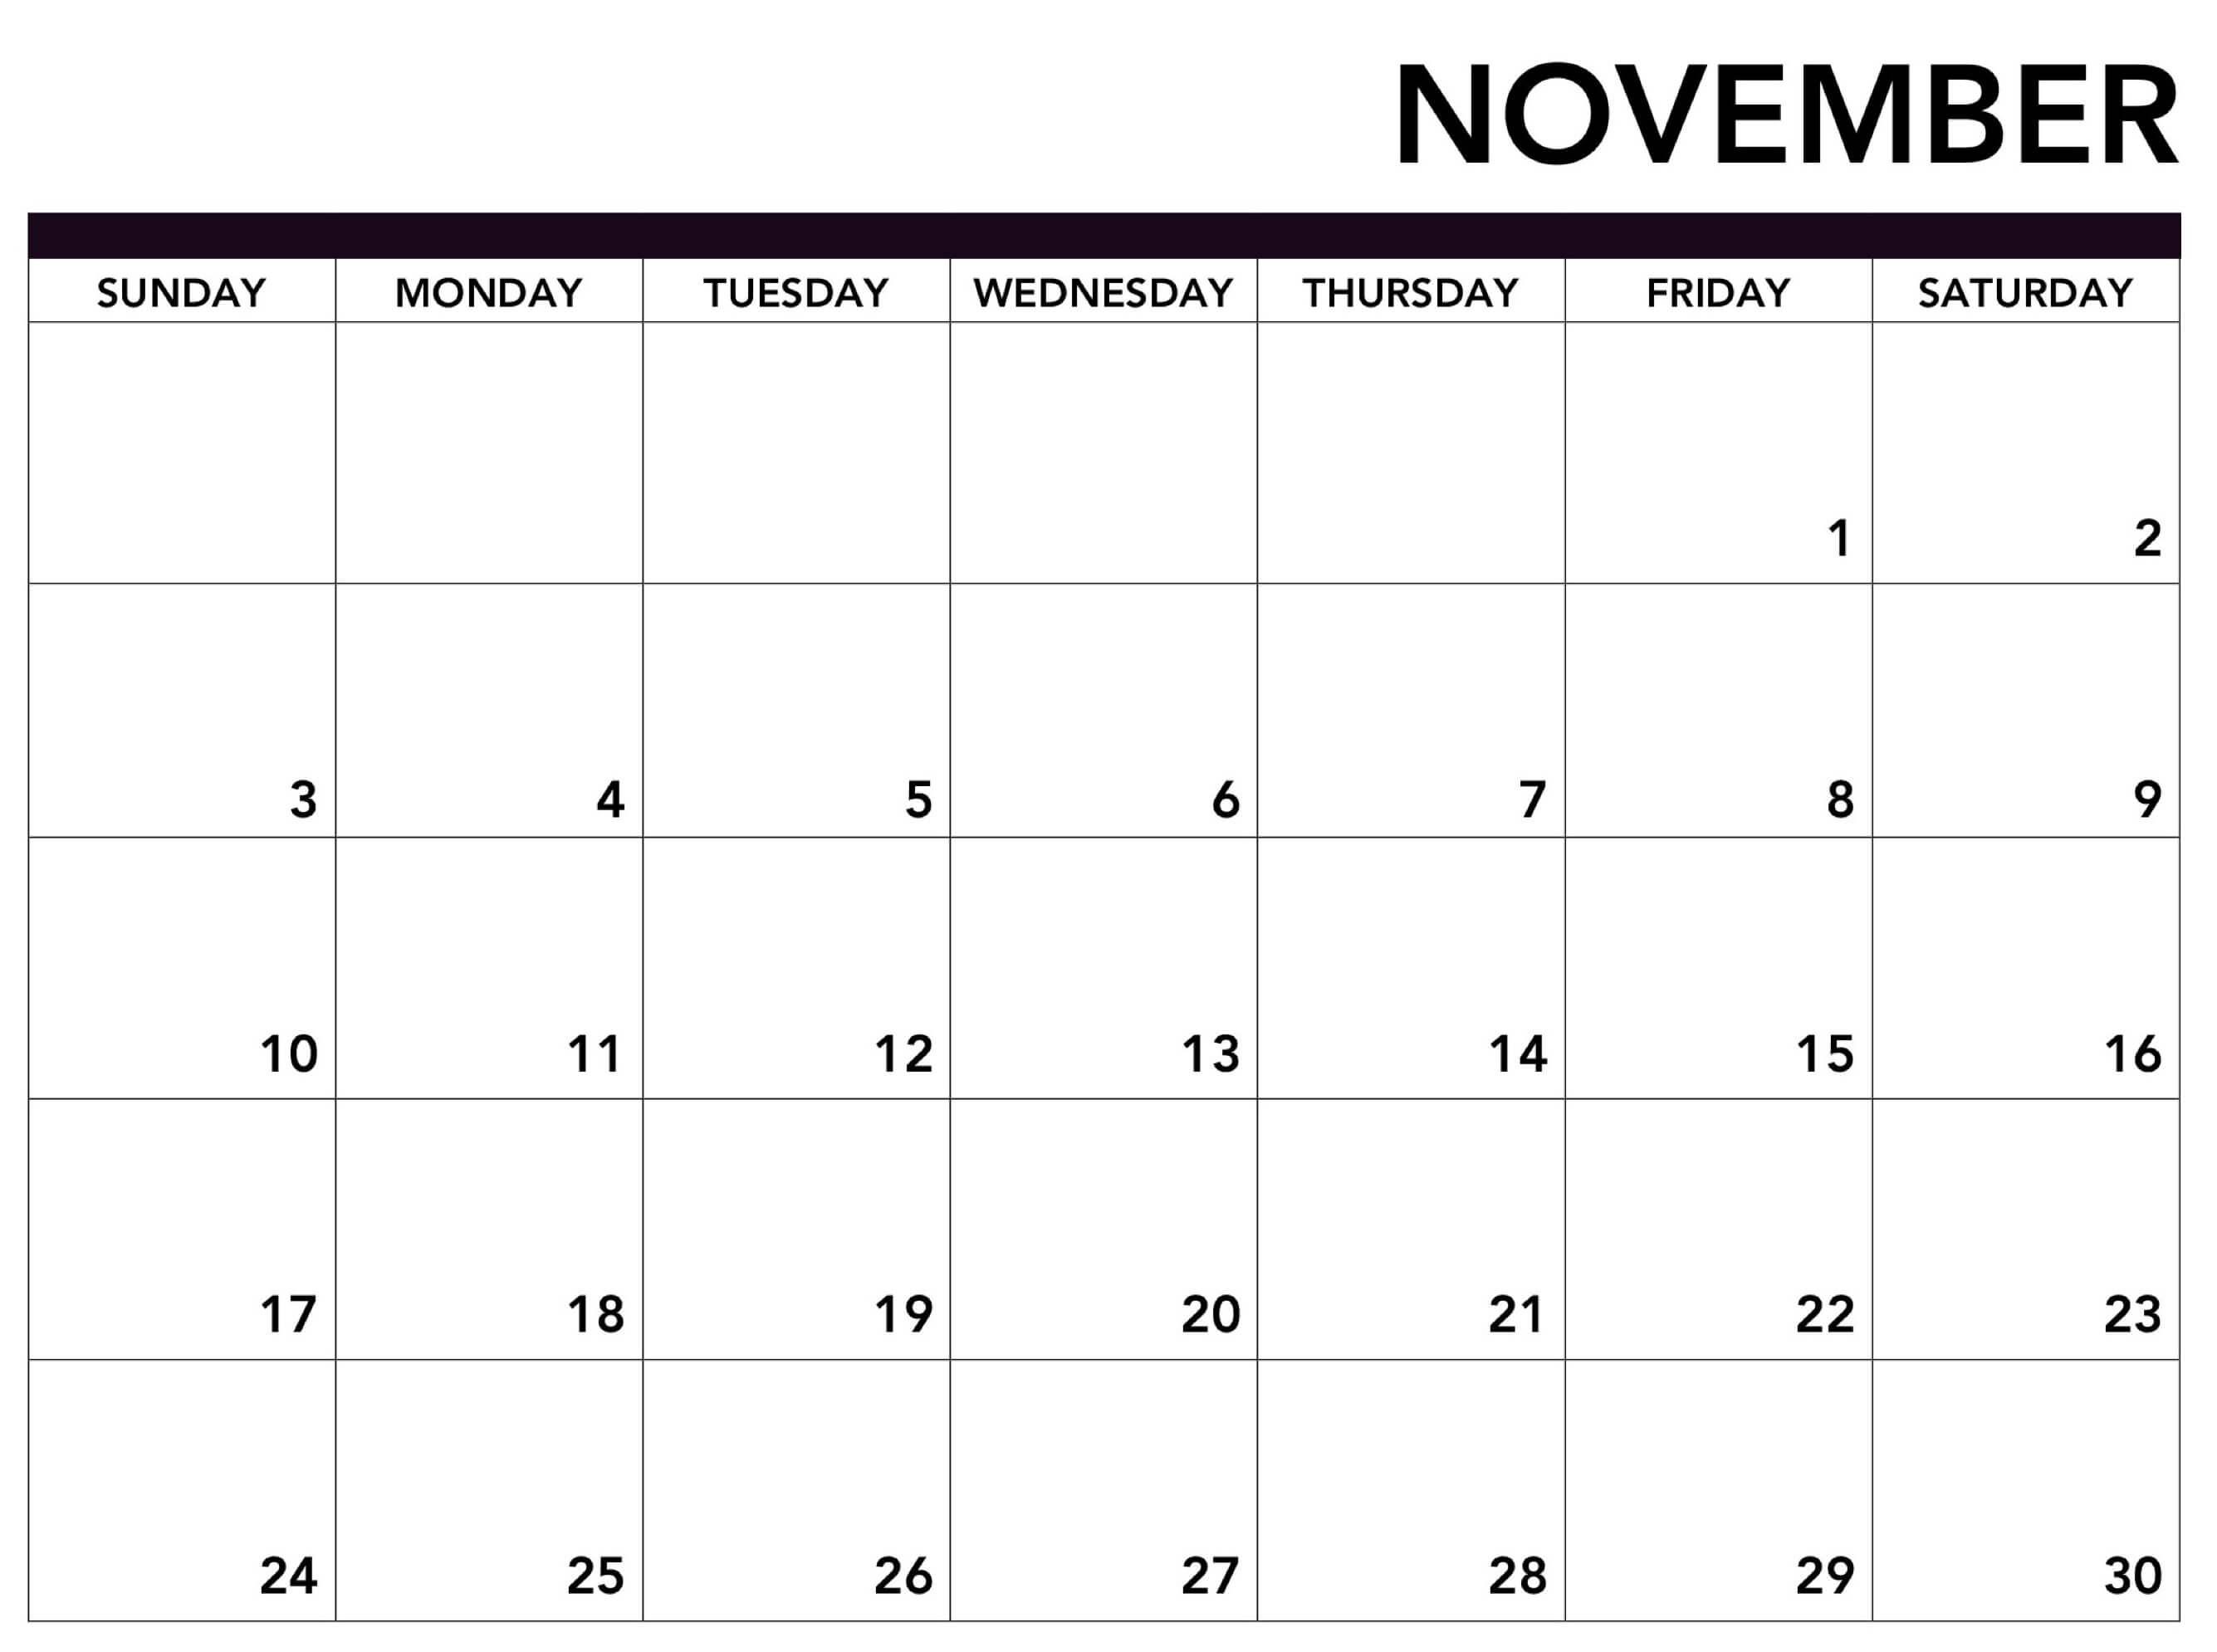 Free Printable November Calendar 2019 - 2019 Calendars For